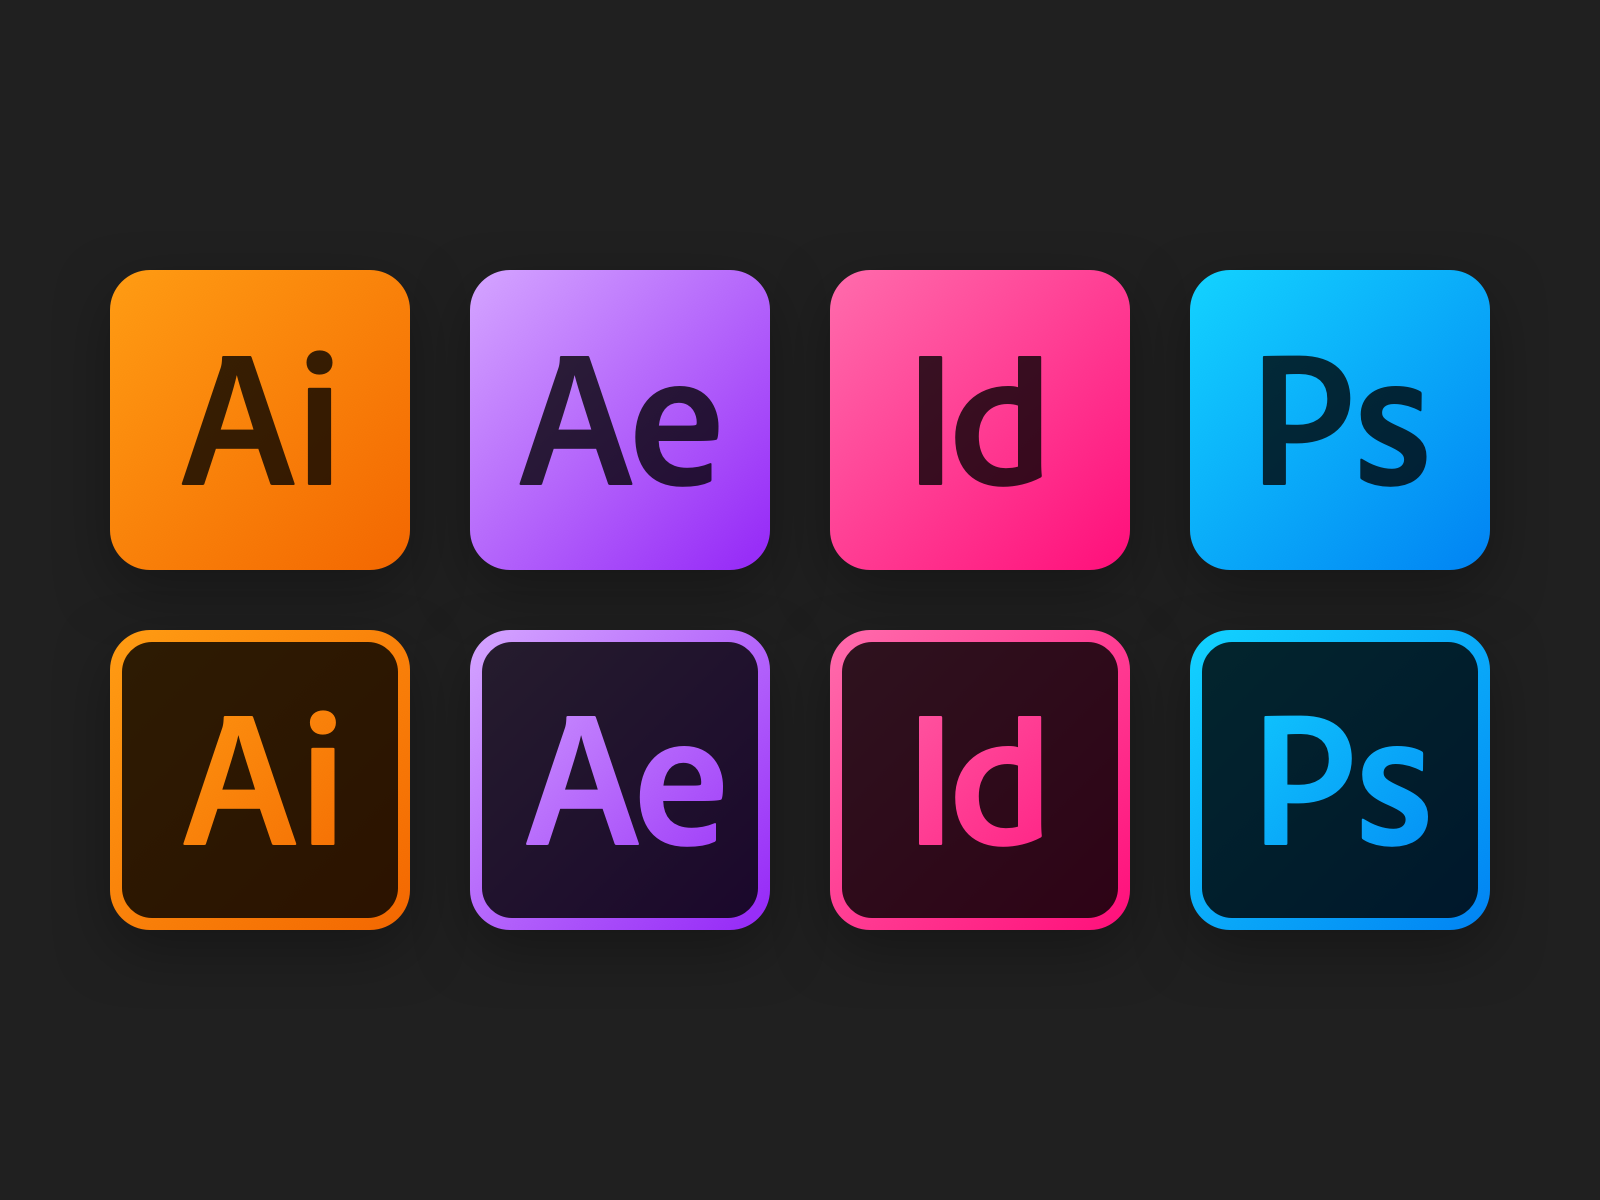 Adobe Icons logo, Photo retouching services